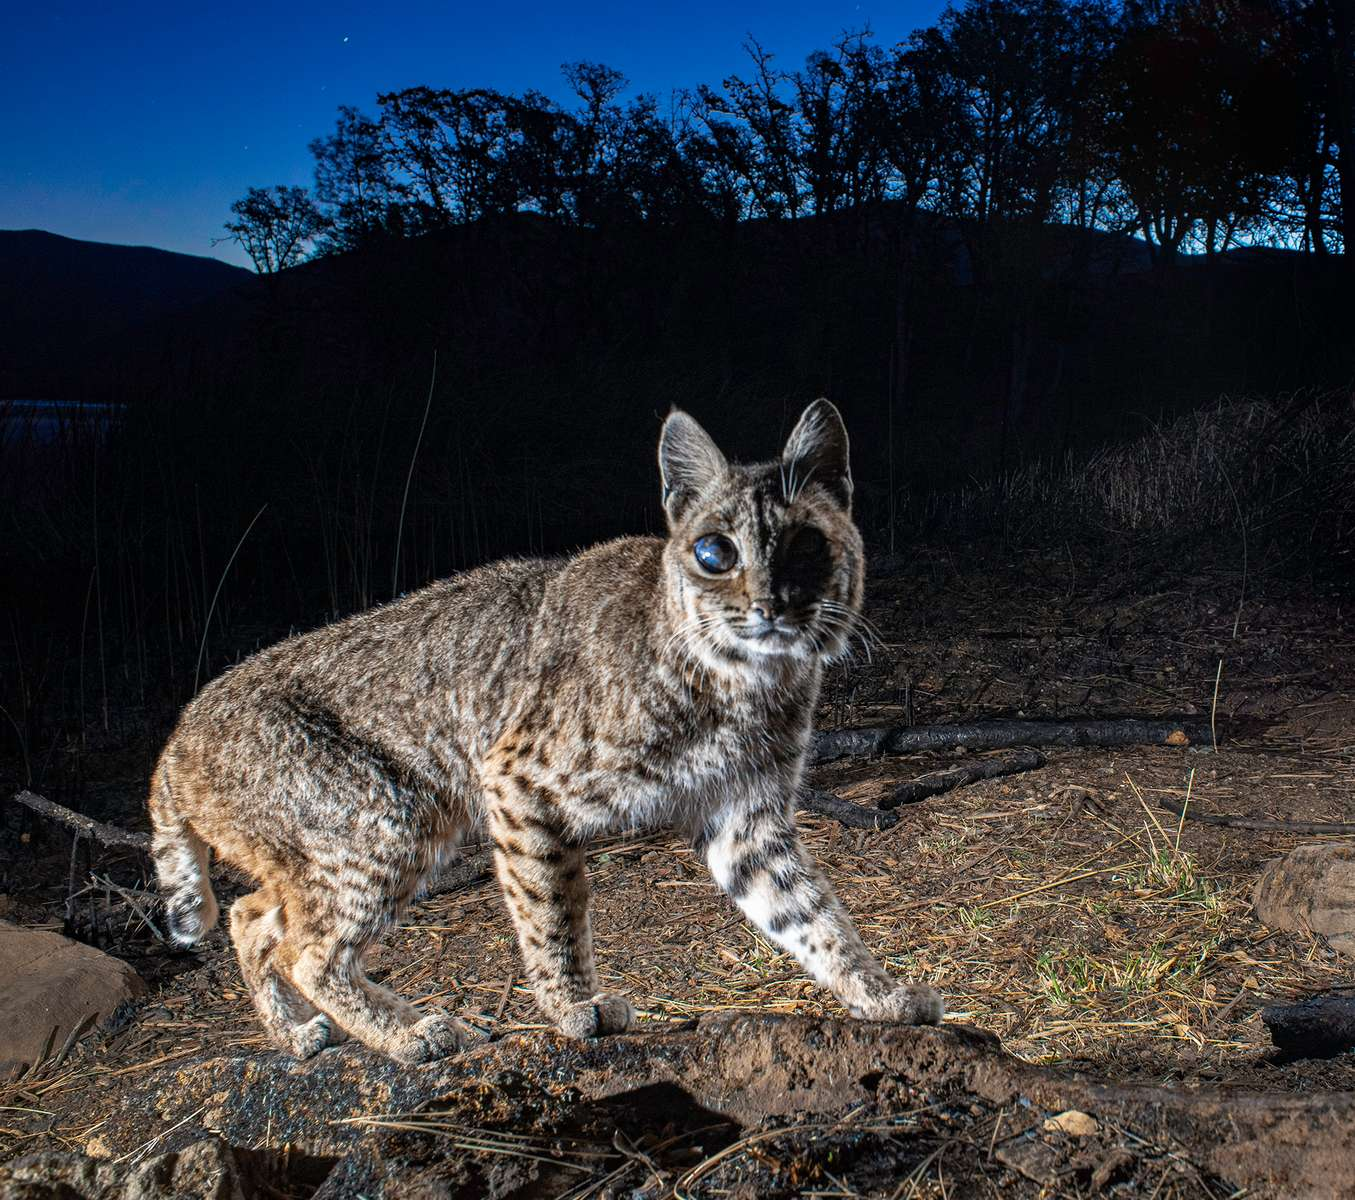 Bobcat with proptosis of the eye. (Camera Trap)